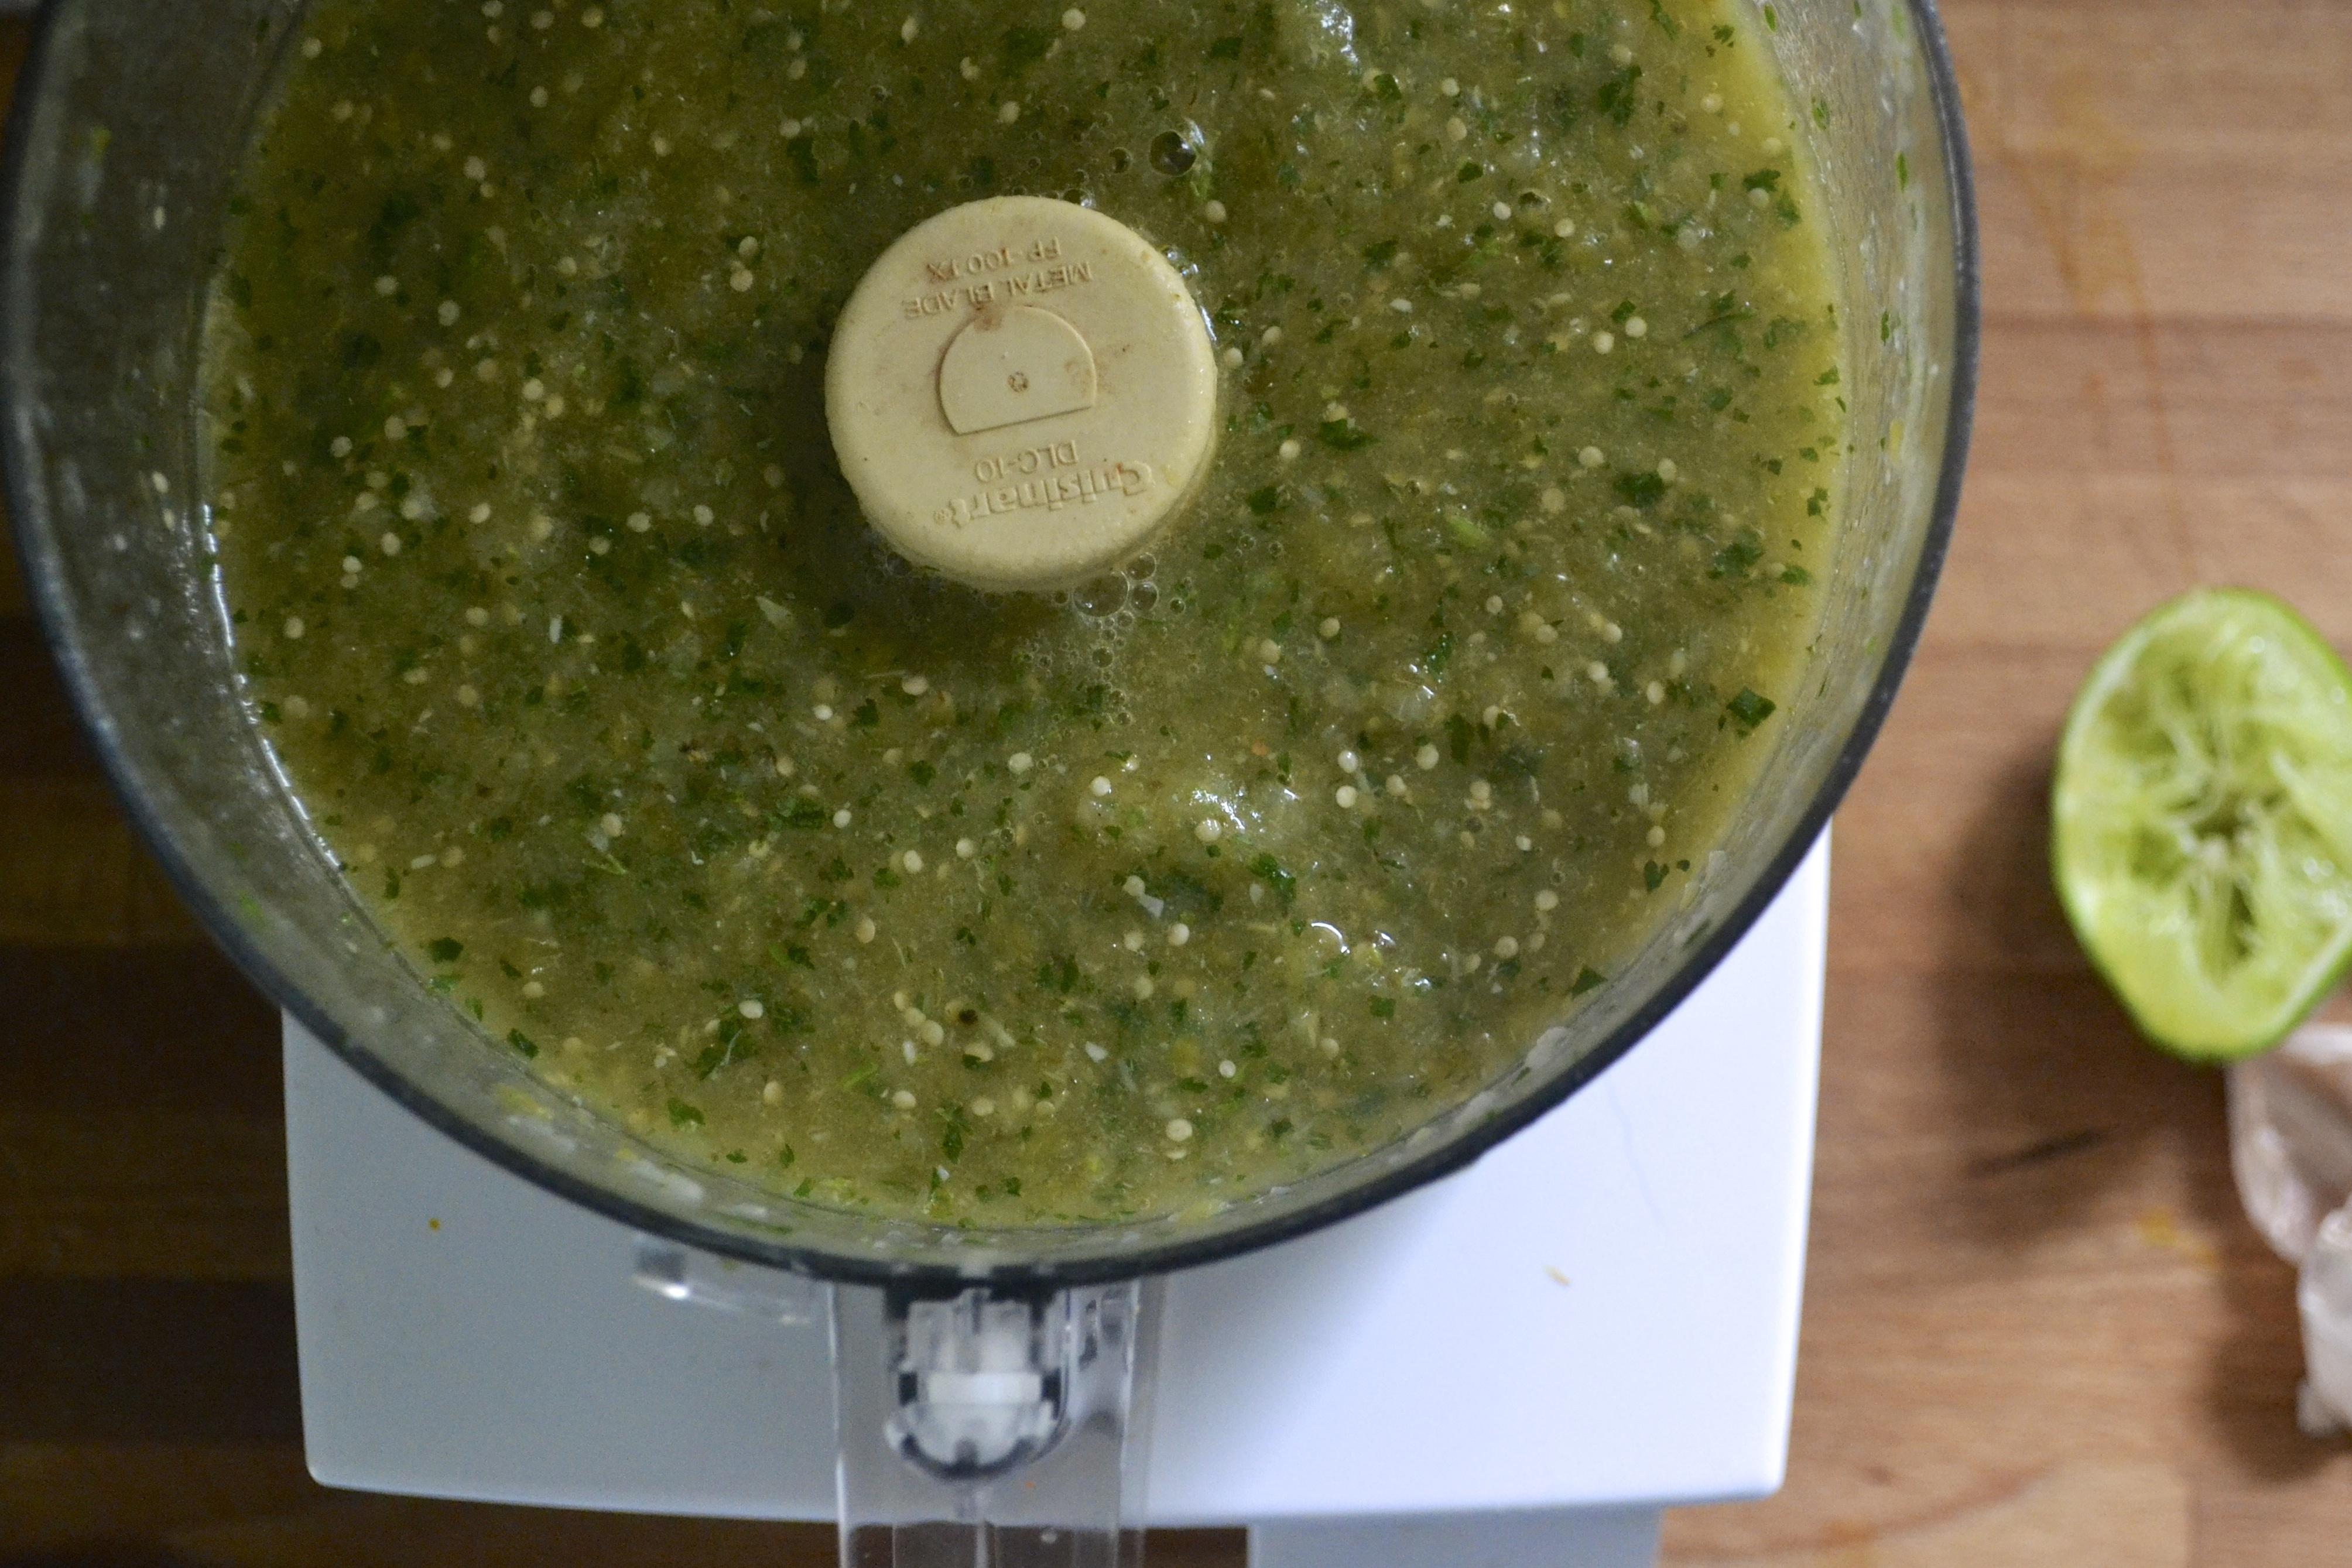 tomatillo salsa salsa aka salsa verde verde mexicana salsa verde